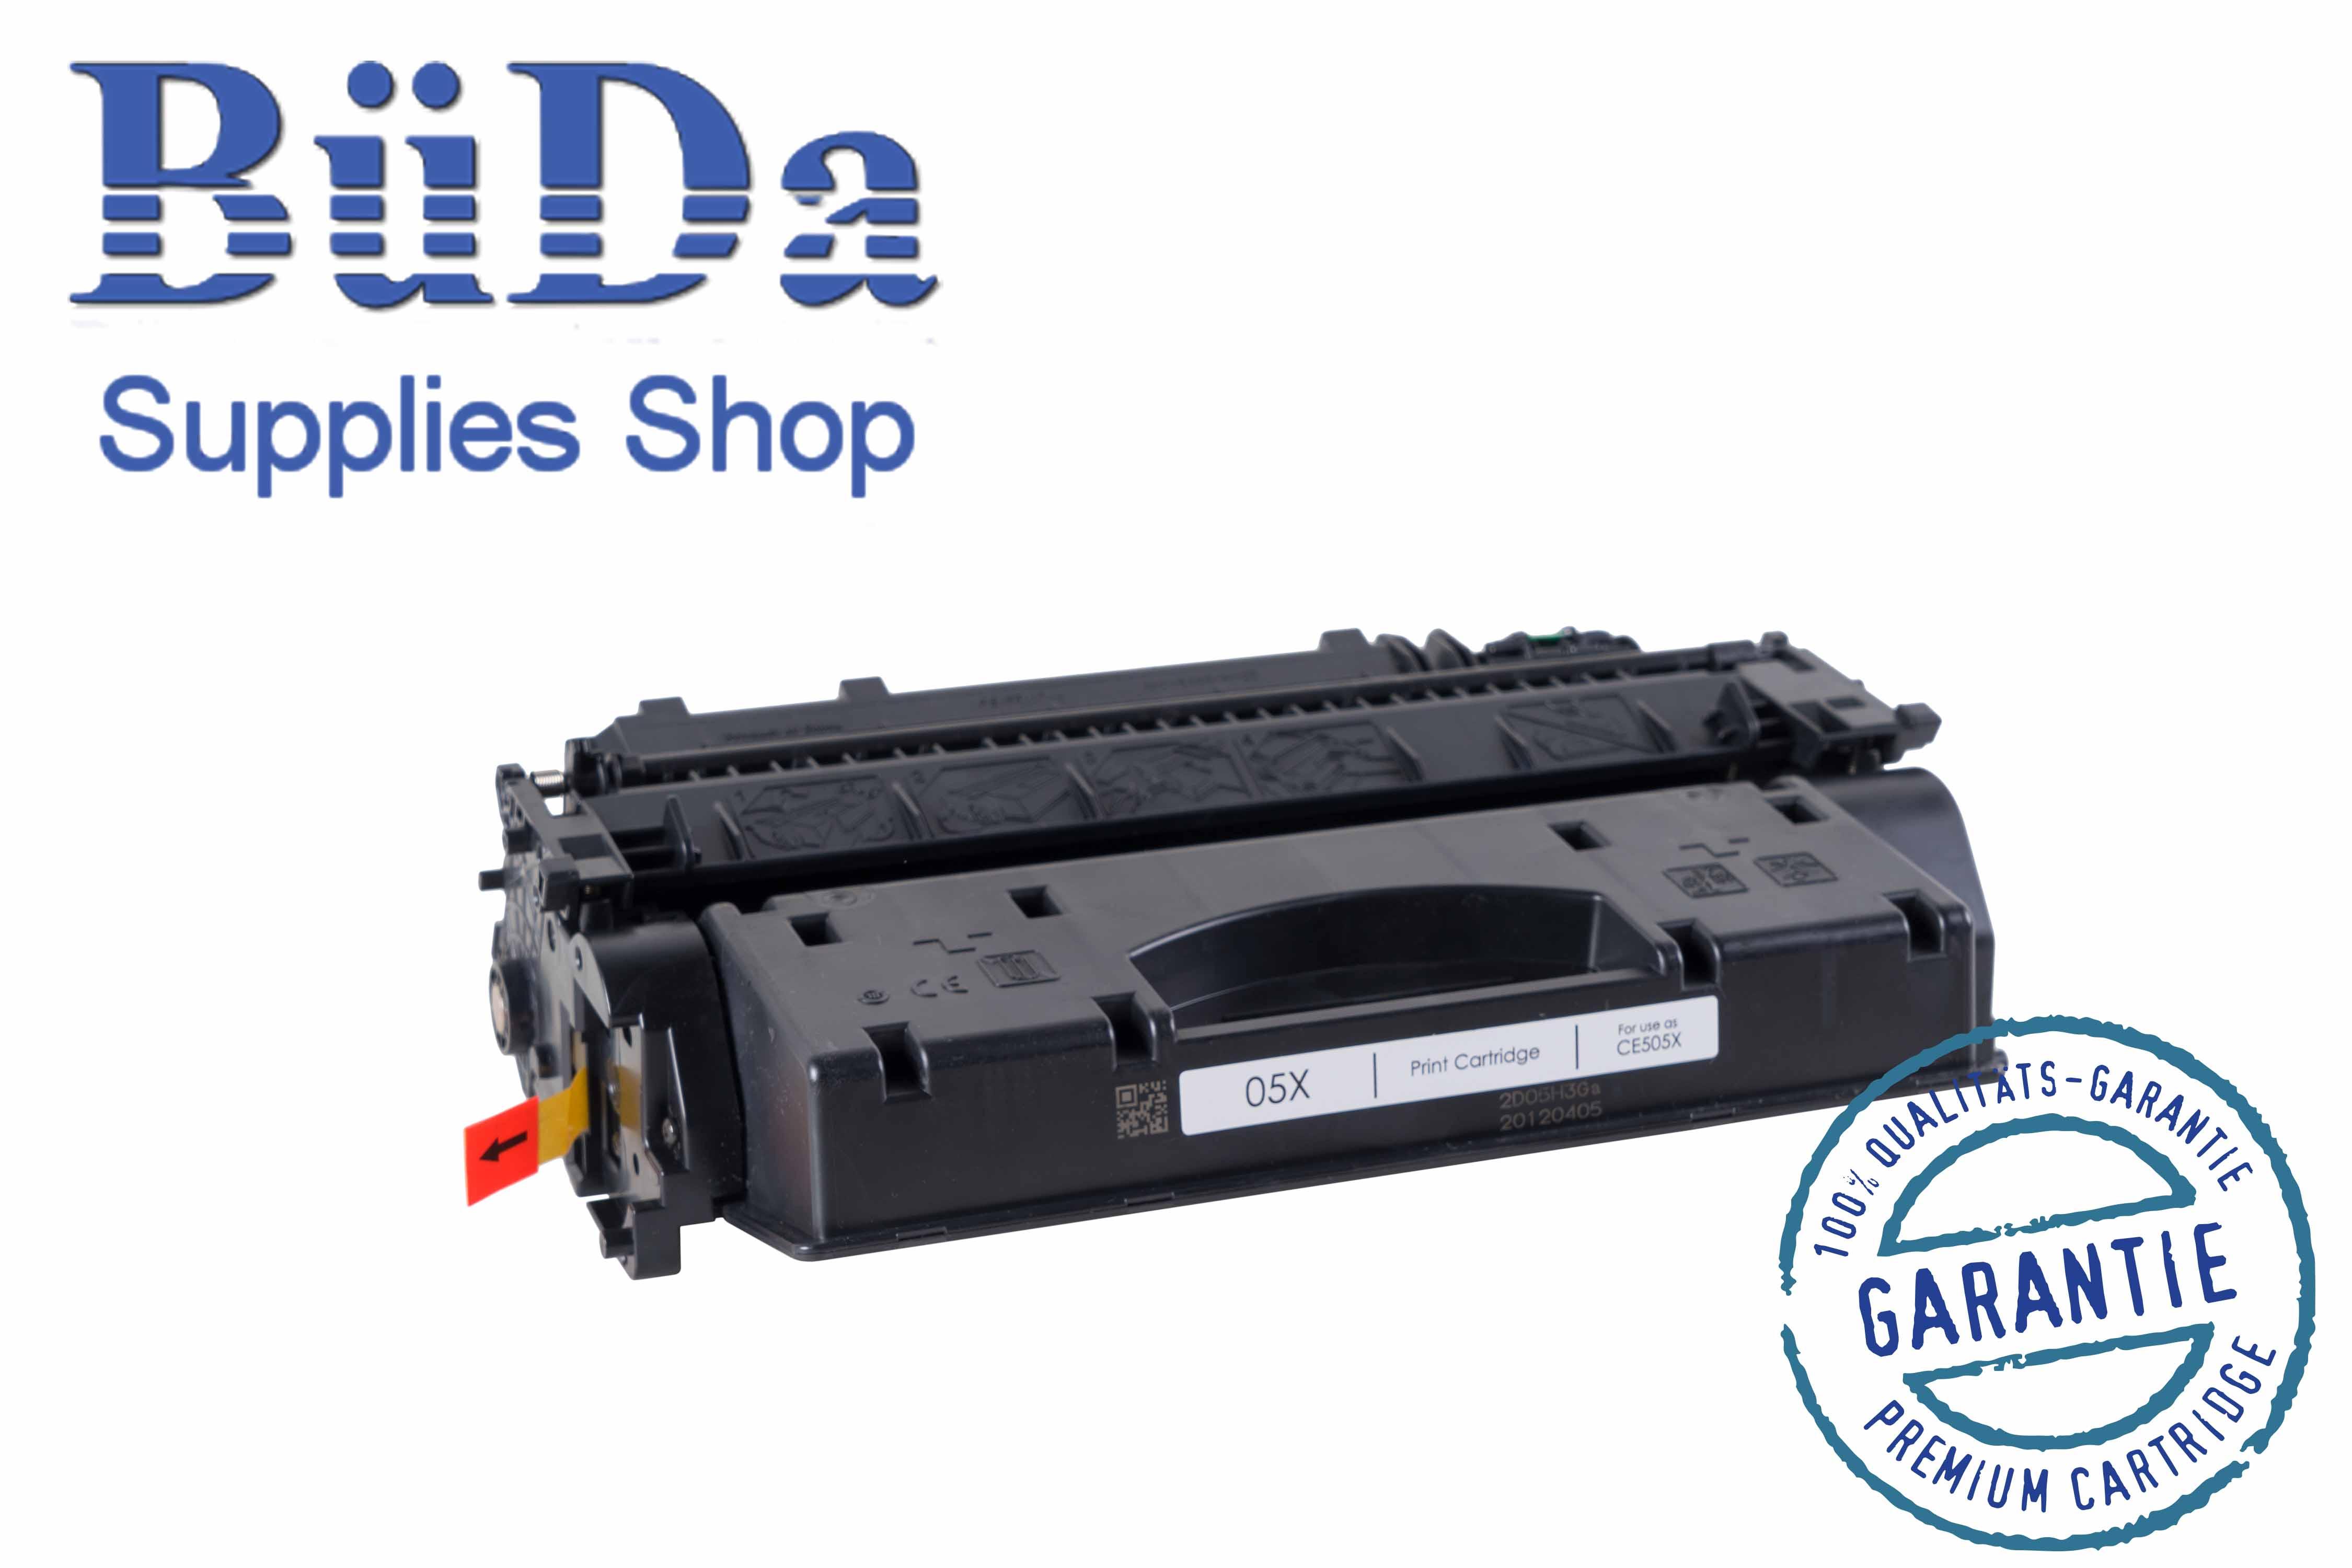 Toner-Modul komp. zu CE505X / Crt. 719H black 6500 Seiten